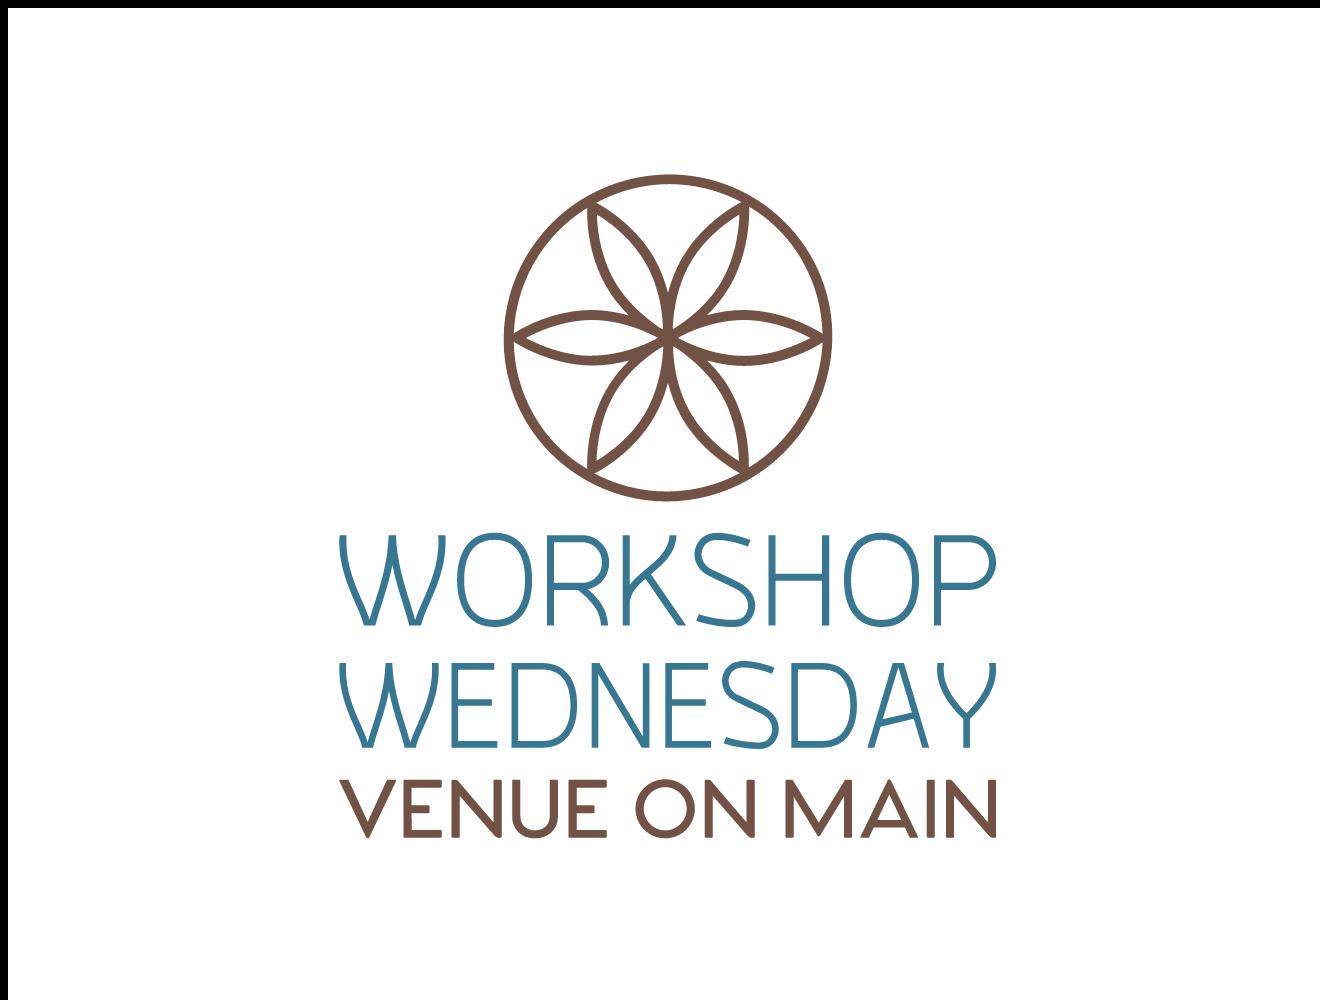 workshop wednesday logo